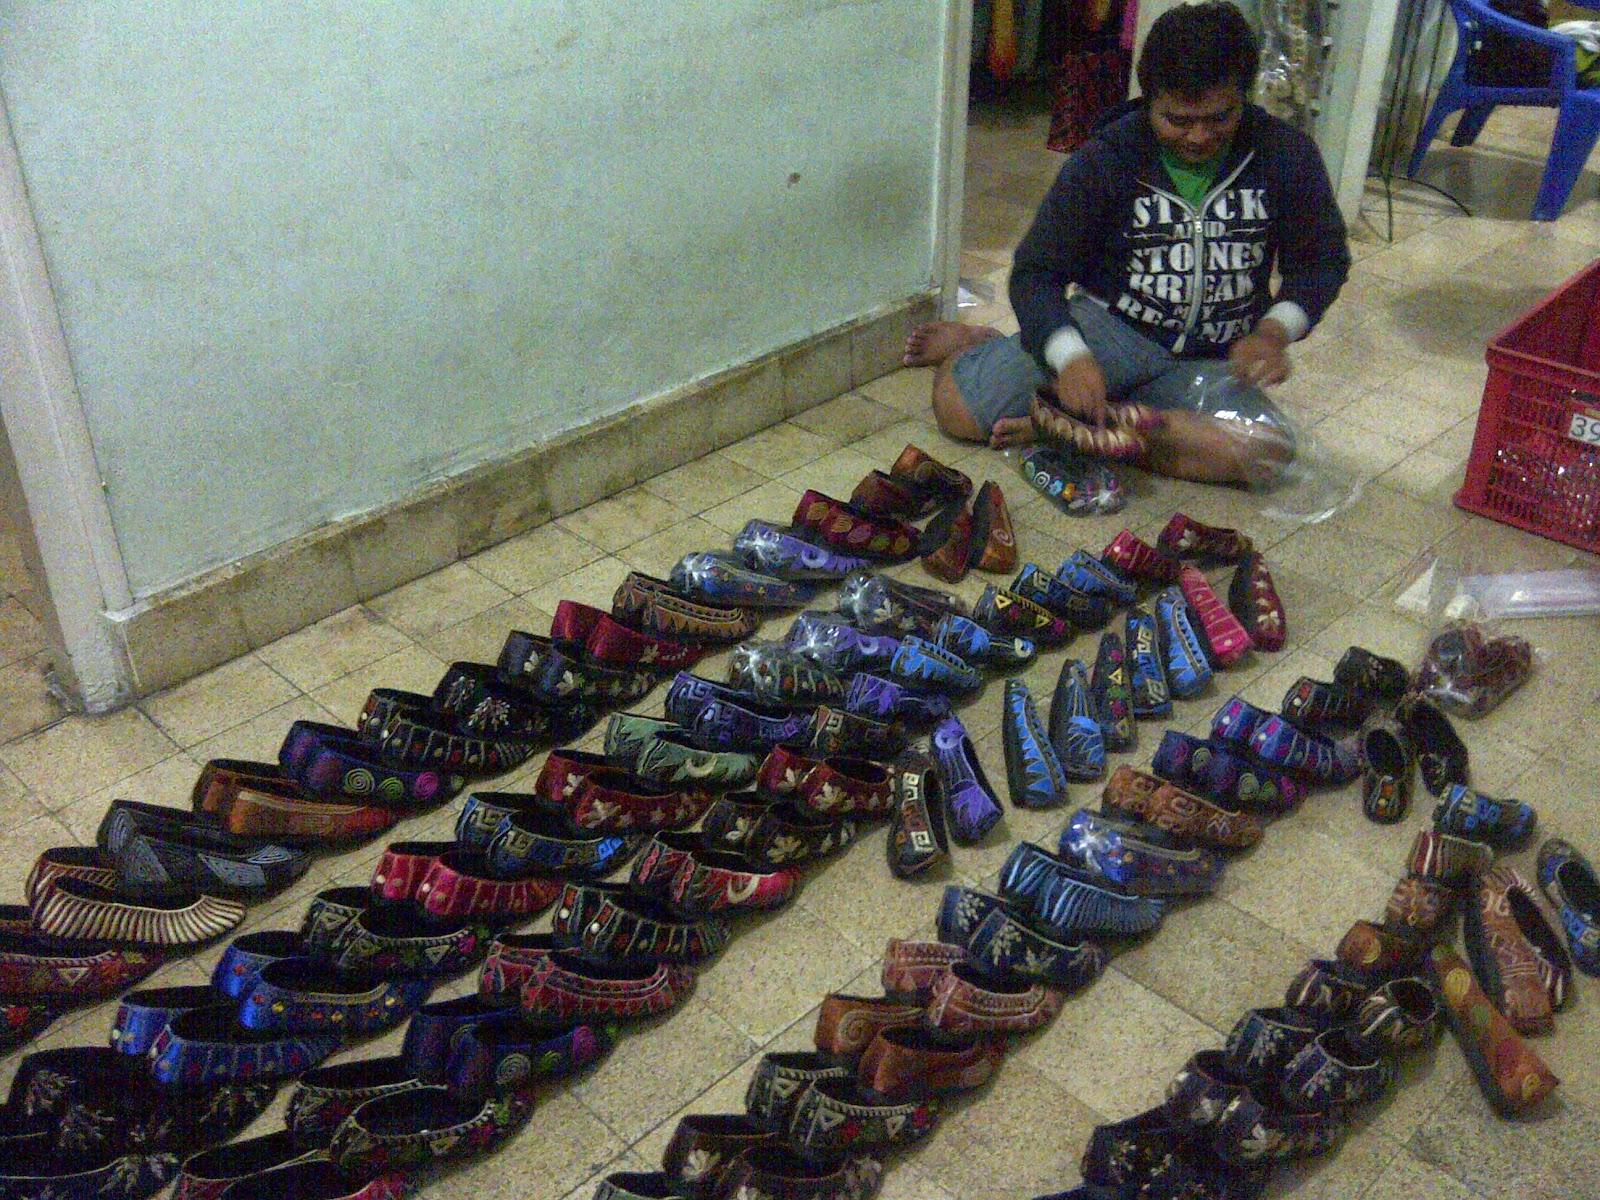 Jual Sepatu Wanita Ukuran Besar, Model Sepatu Wanita 2014, Model Sepatu Wanita Terbaru, www.distributorsepatumurah.com